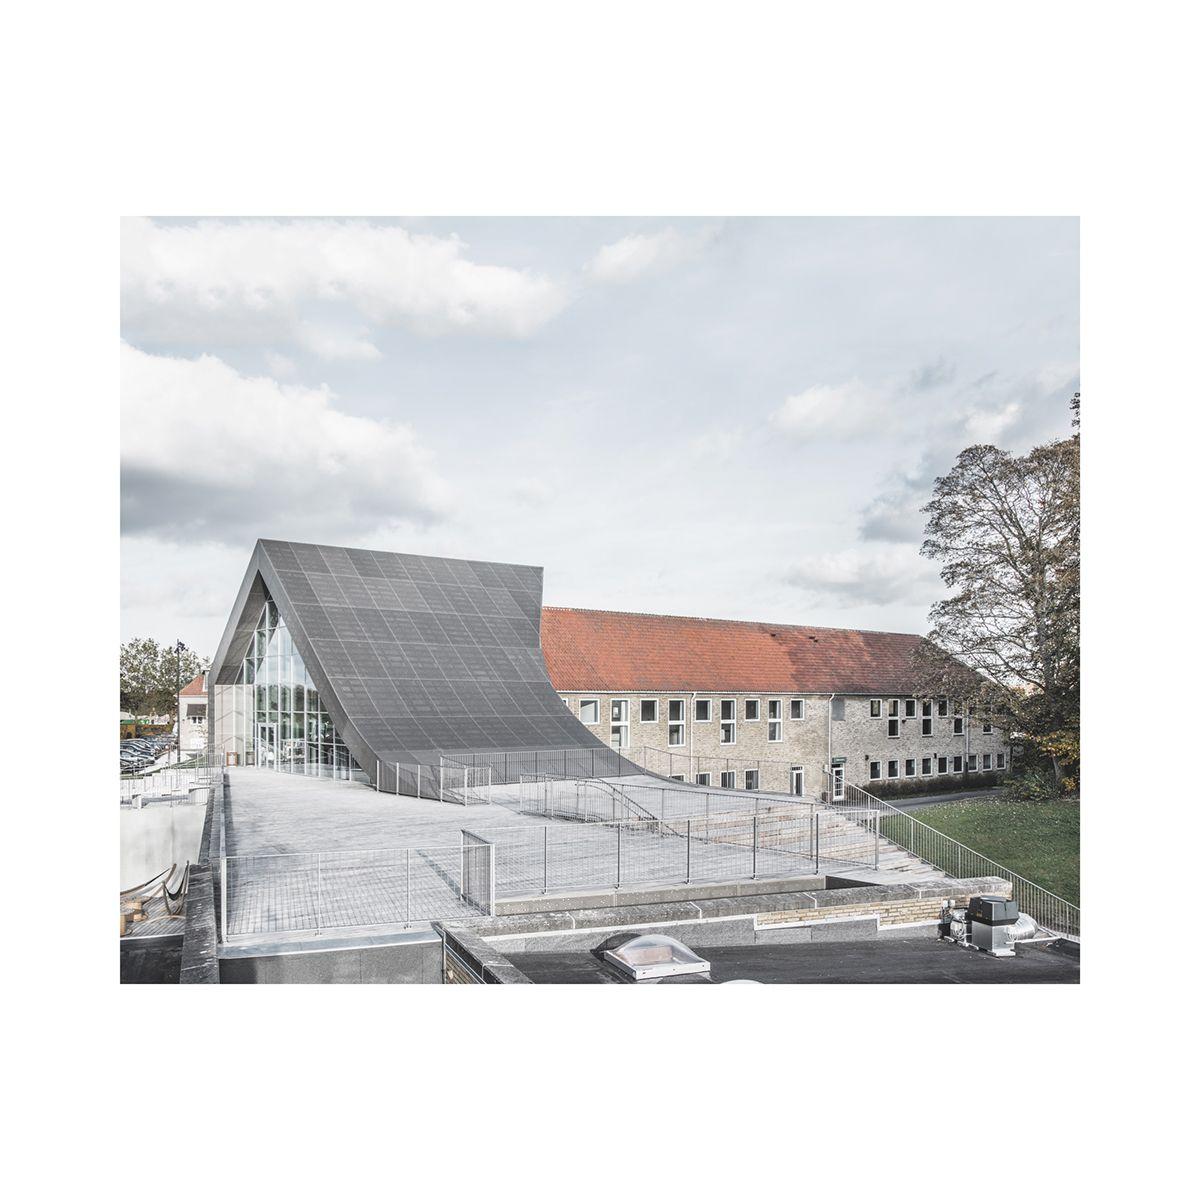 Culture Center Mariehøjby Sophus Søbye arkitekter + WE architectureHolte Municipality, Denmark